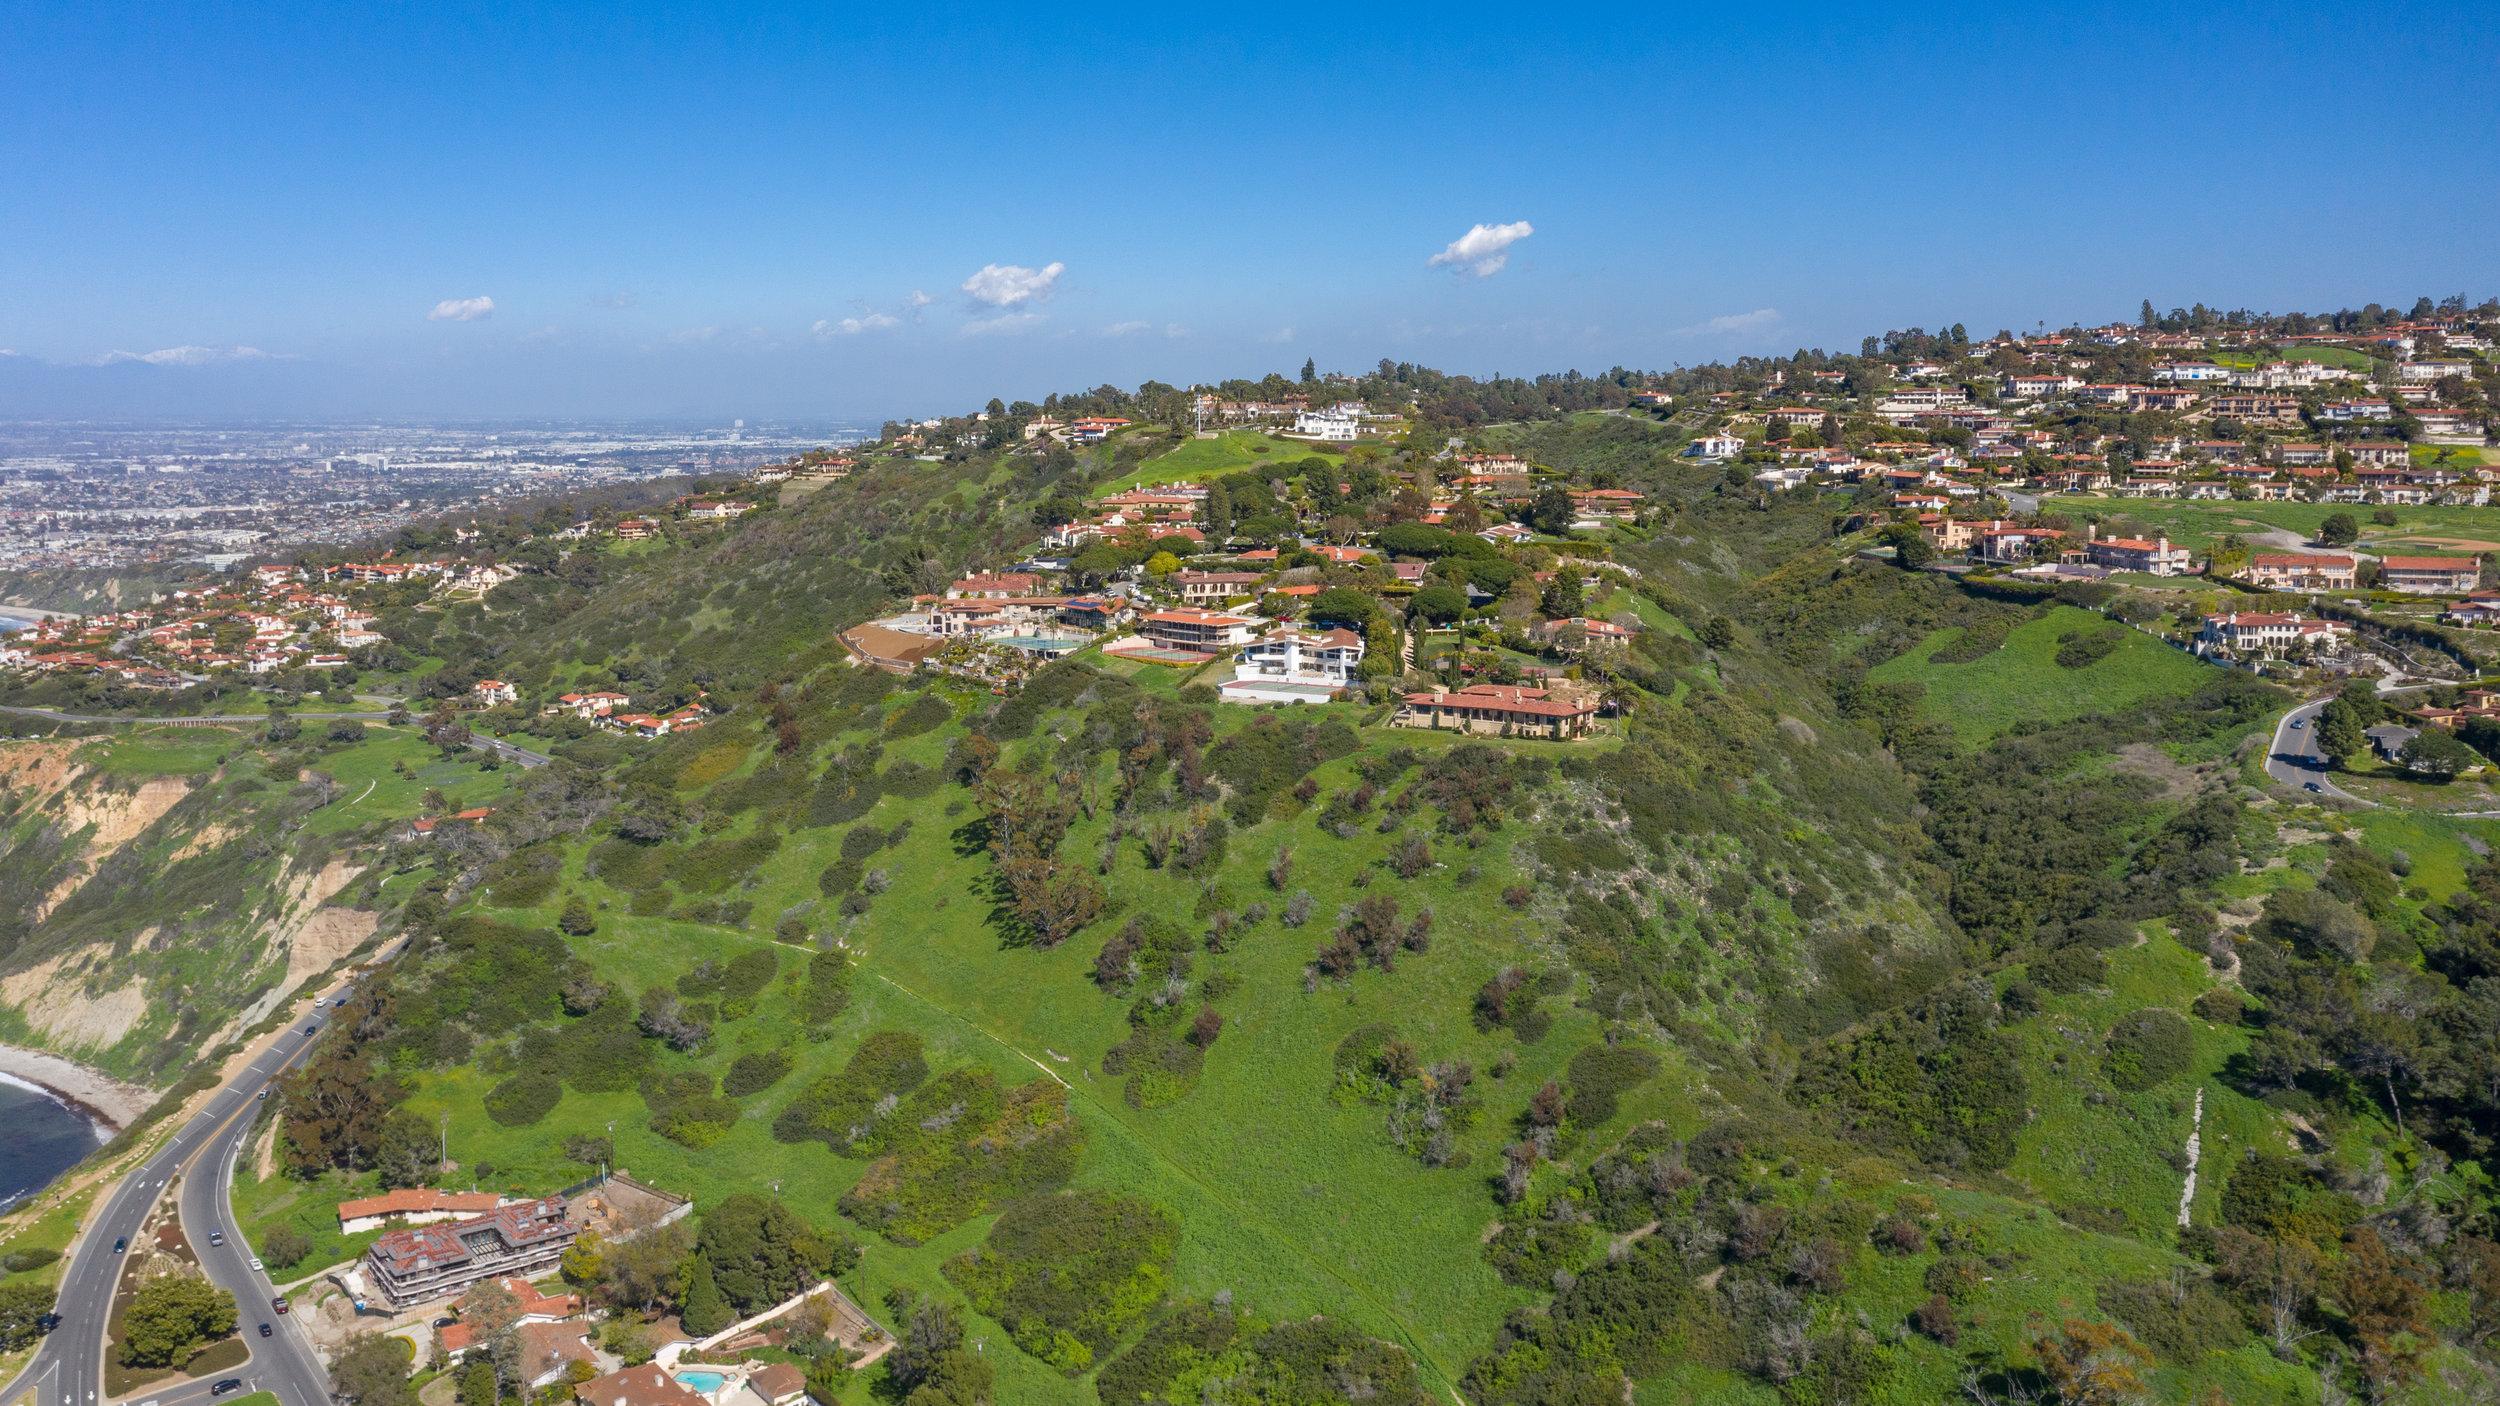 190313-0174 948 Paseo La Cresta Palos Verdes Estates.JPG